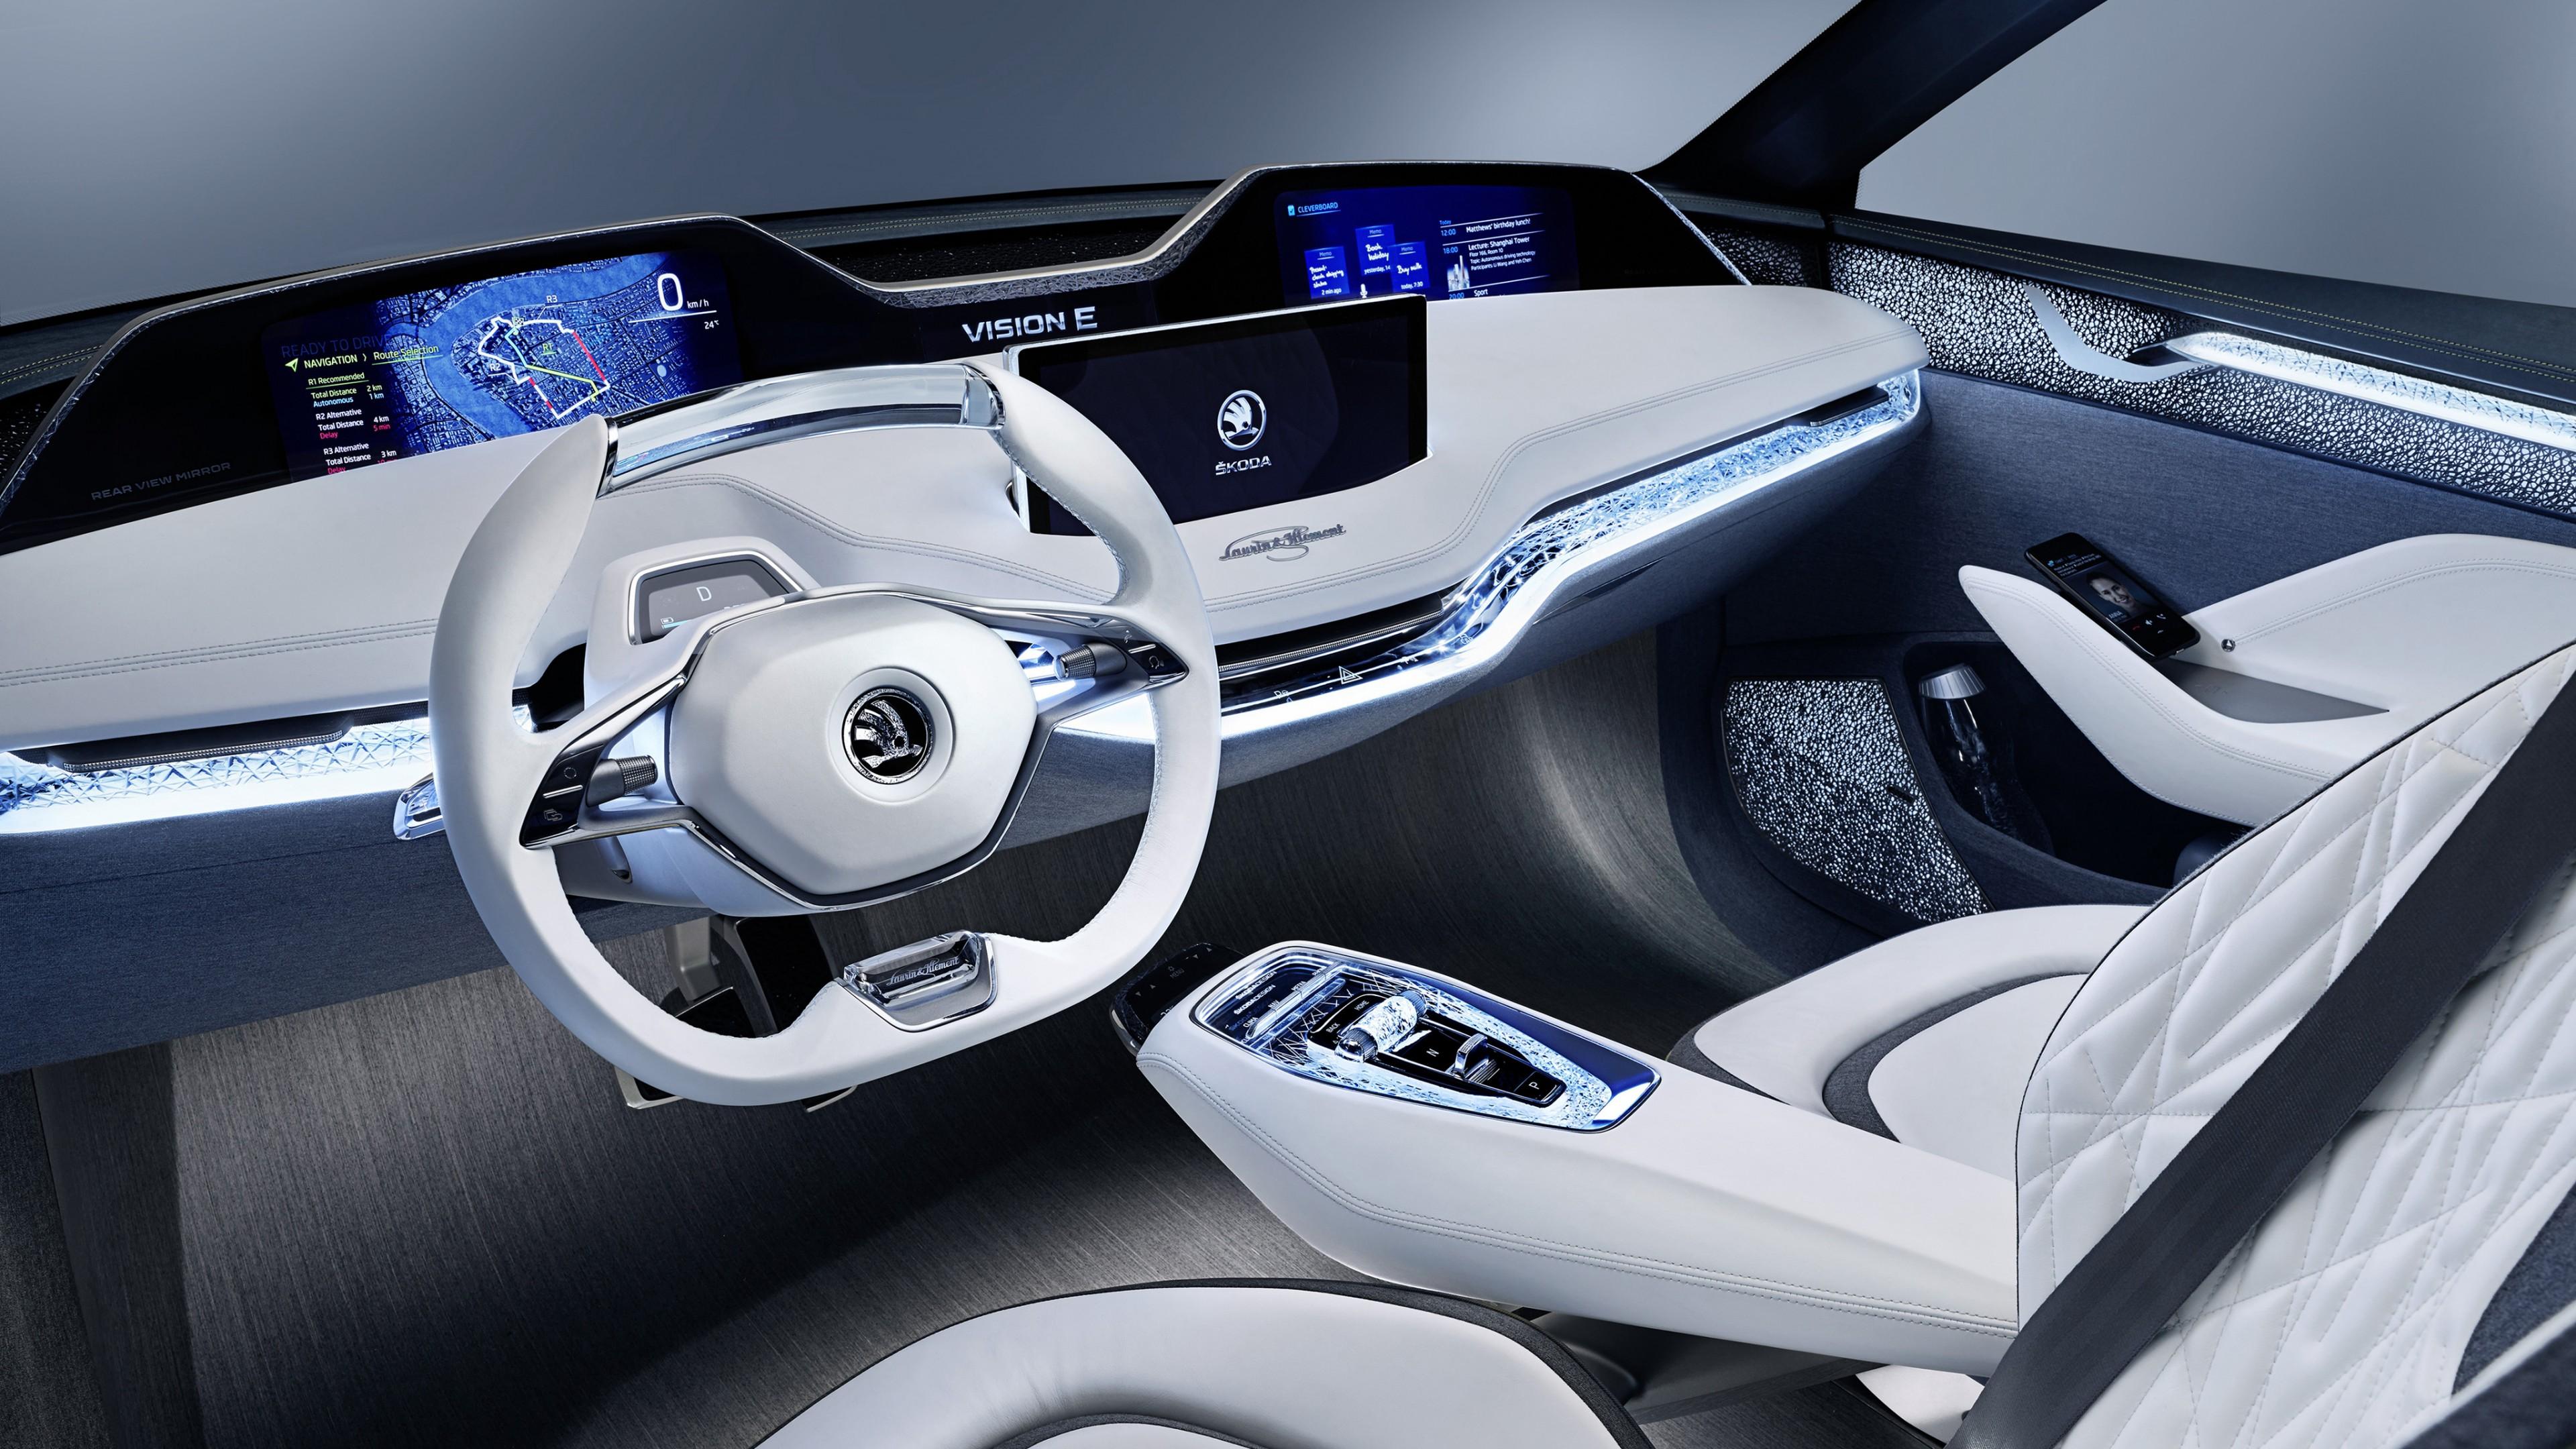 Buick Enclave Interior >> Skoda Vision E Concept 4K Interior Wallpaper | HD Car Wallpapers | ID #8625